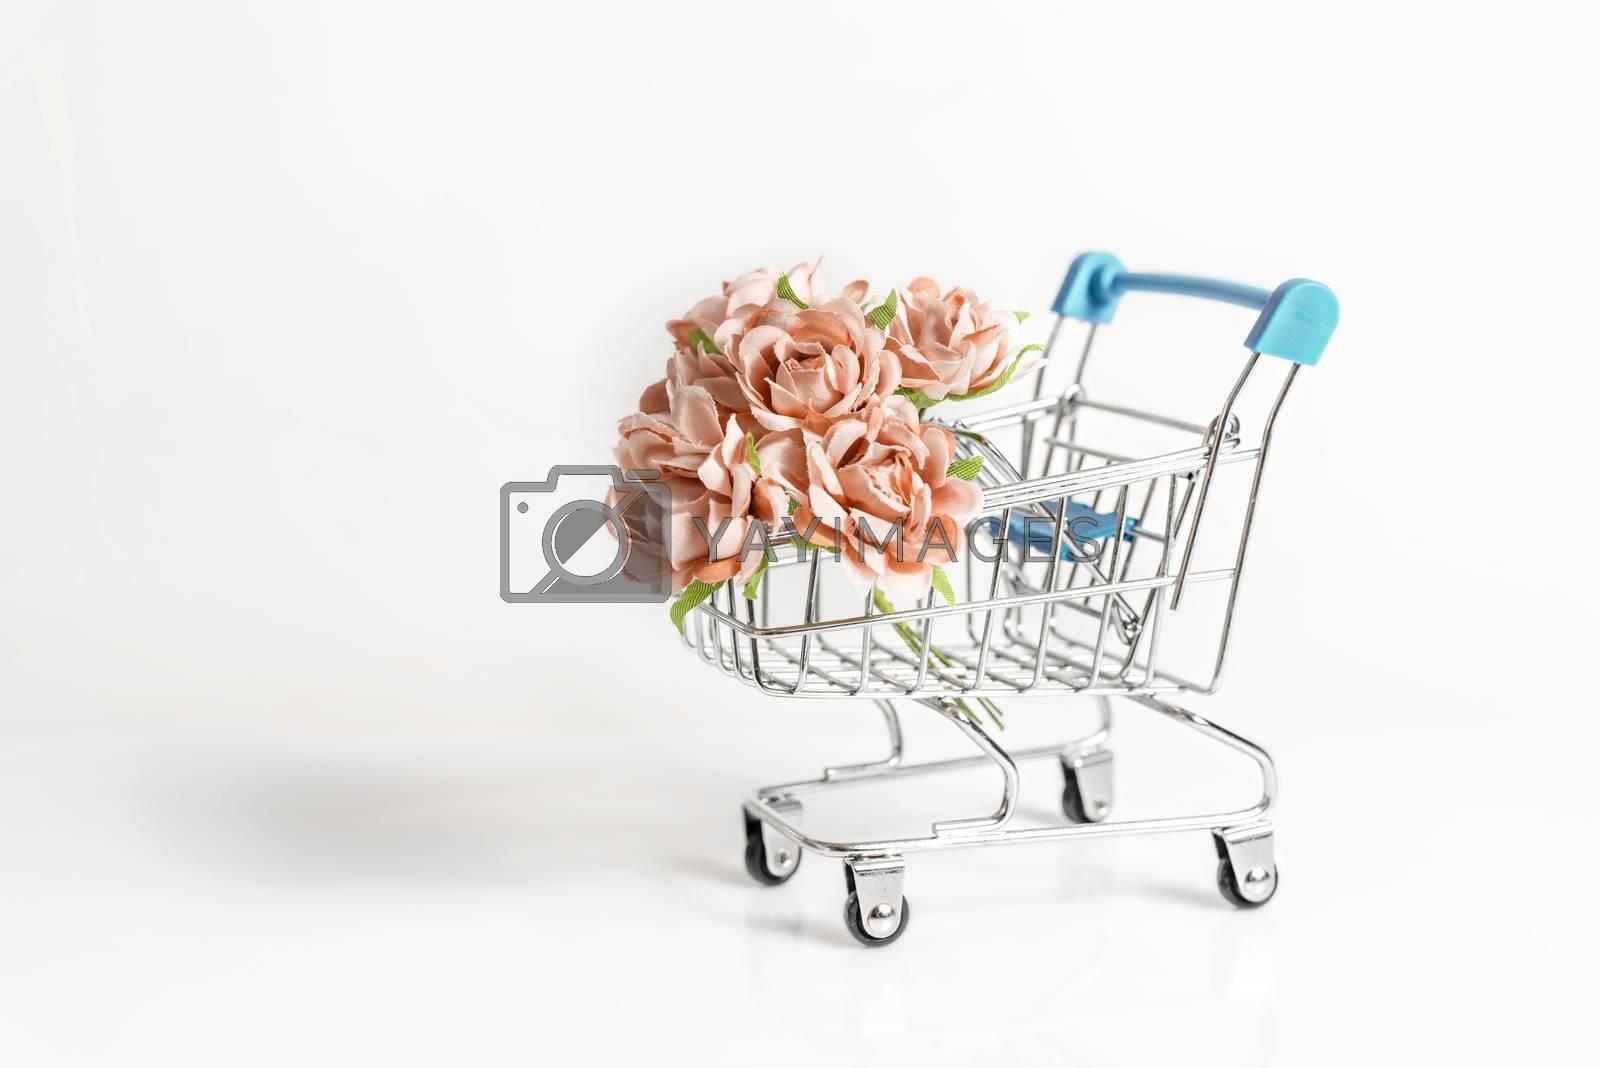 Royalty free image of flowers shopping cart by rakratchada